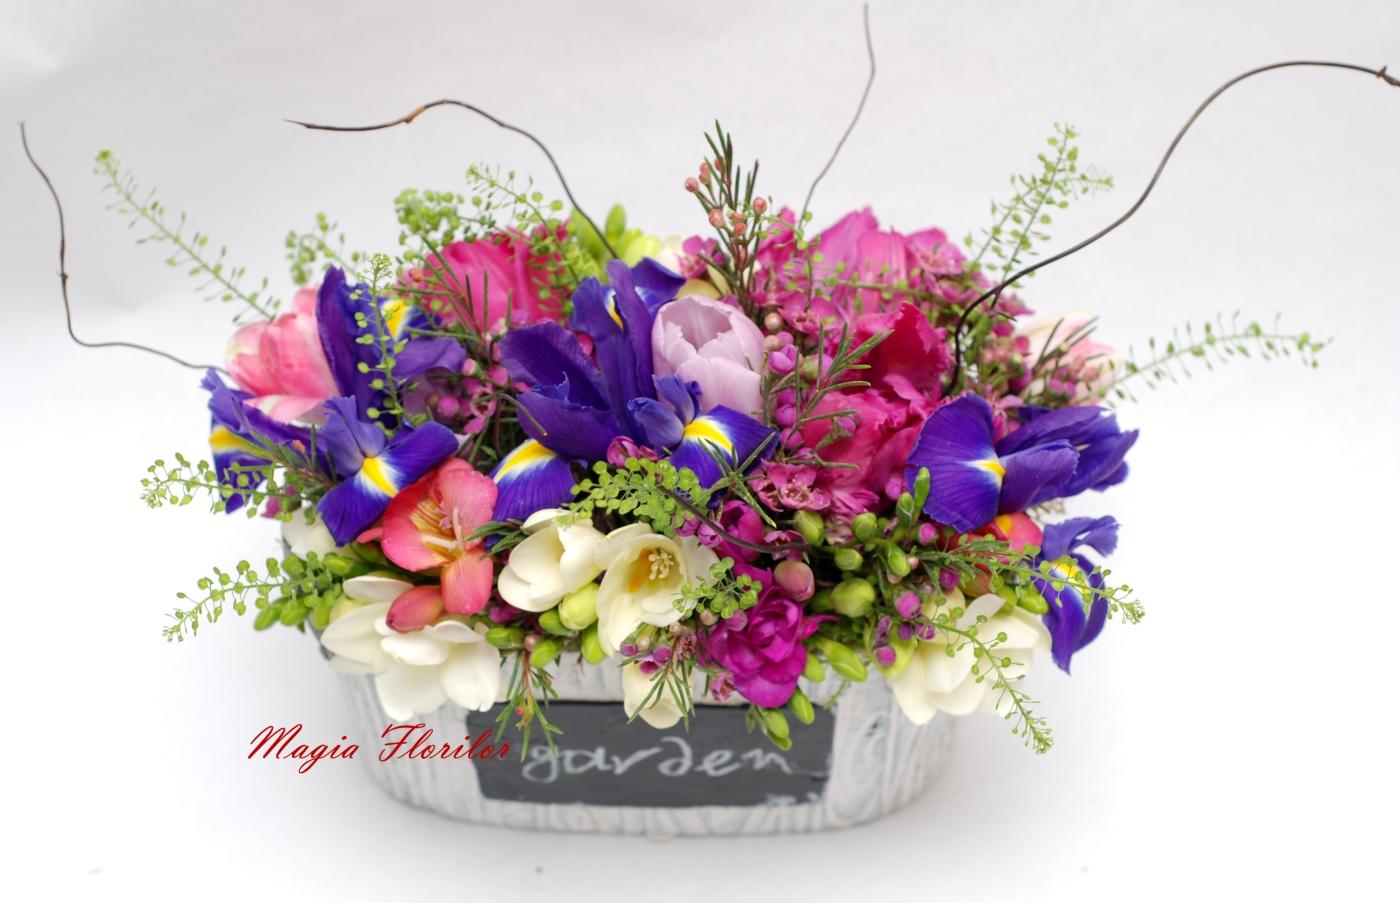 aranjament_floral2.jpg